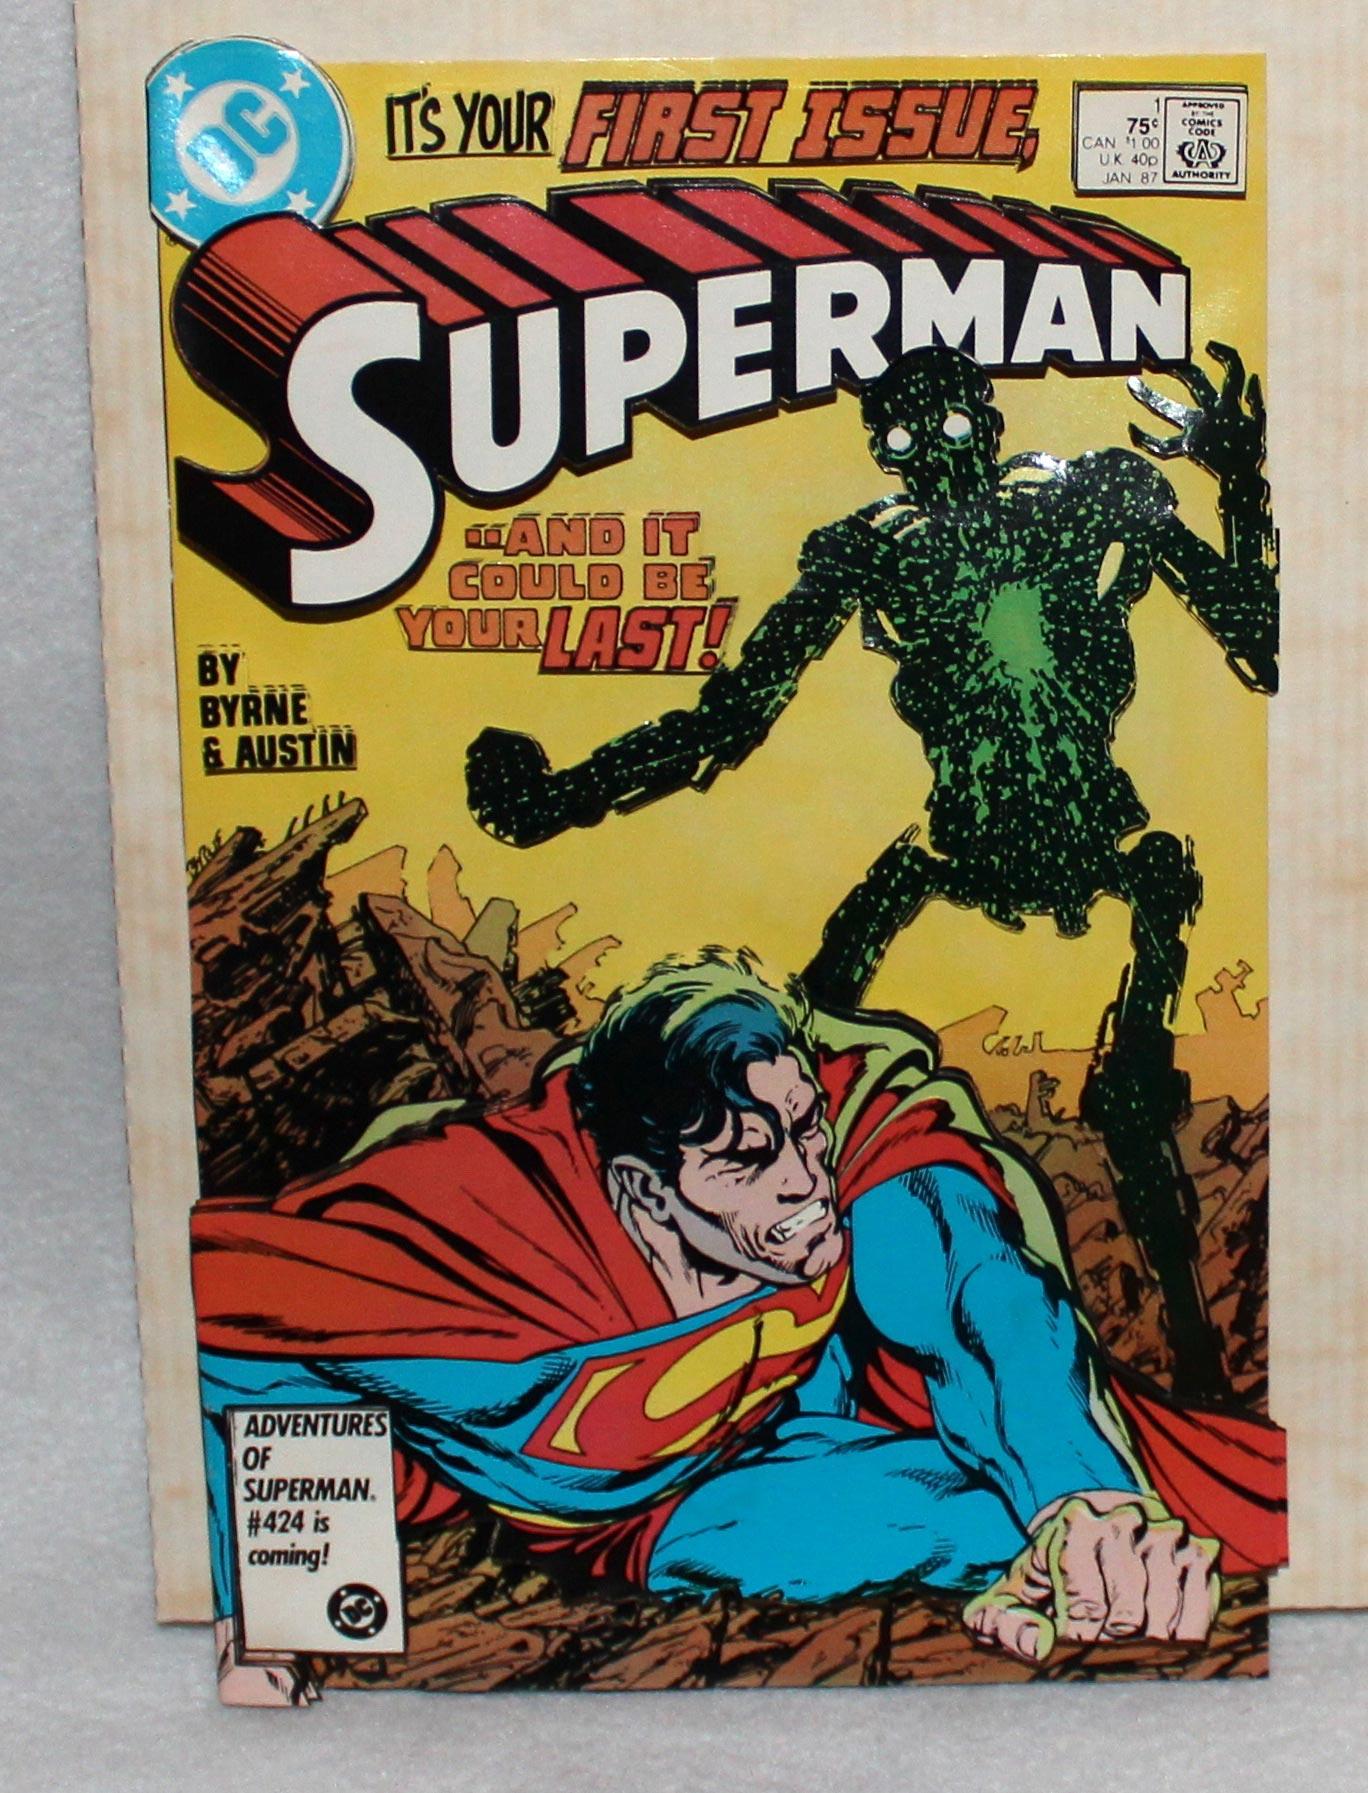 gsfa-3d-superman-01